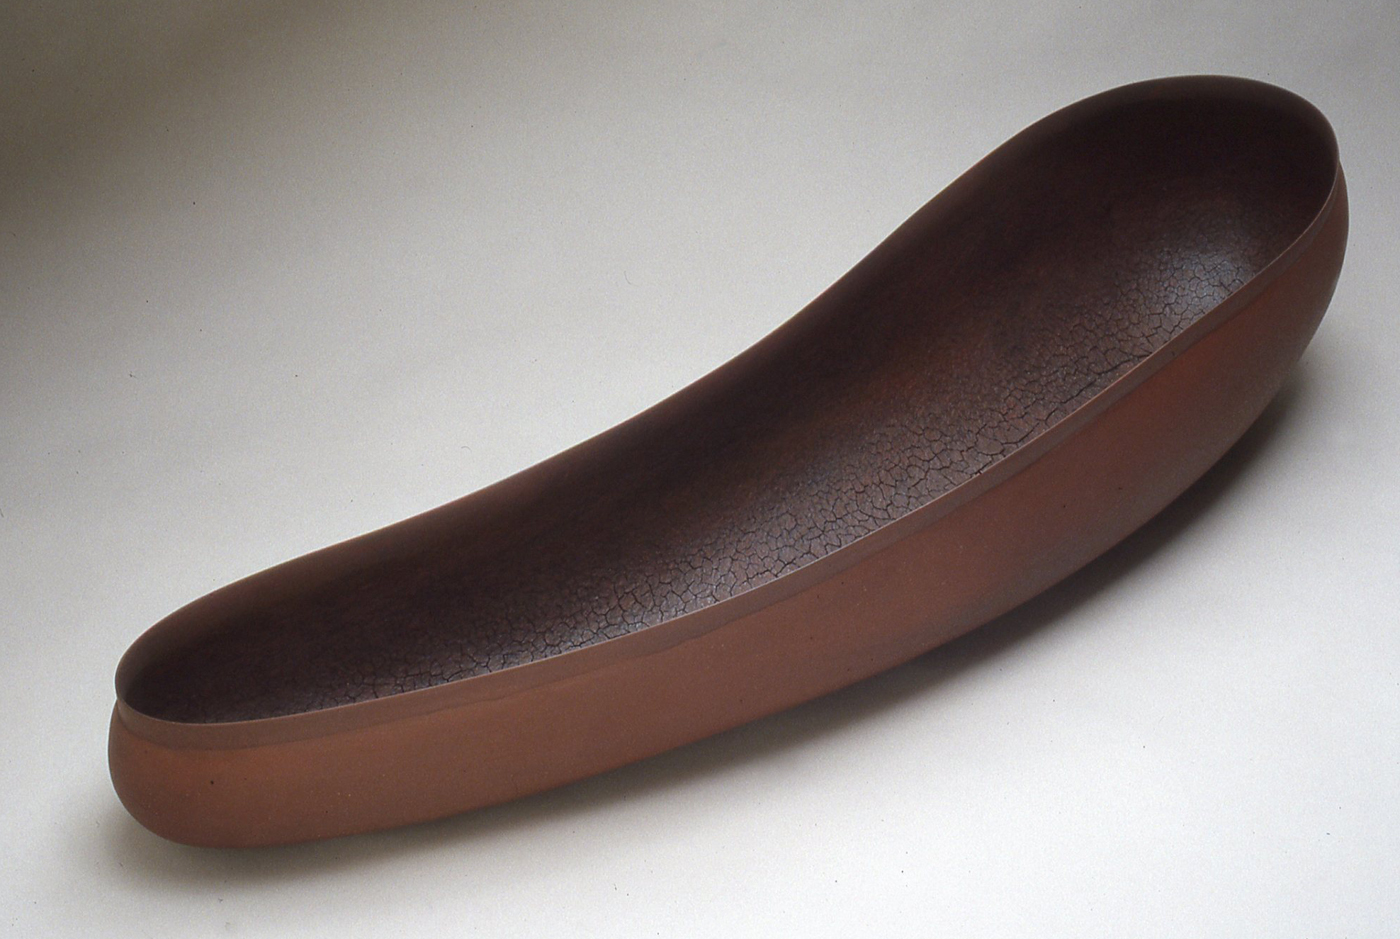 Diatom, 2004